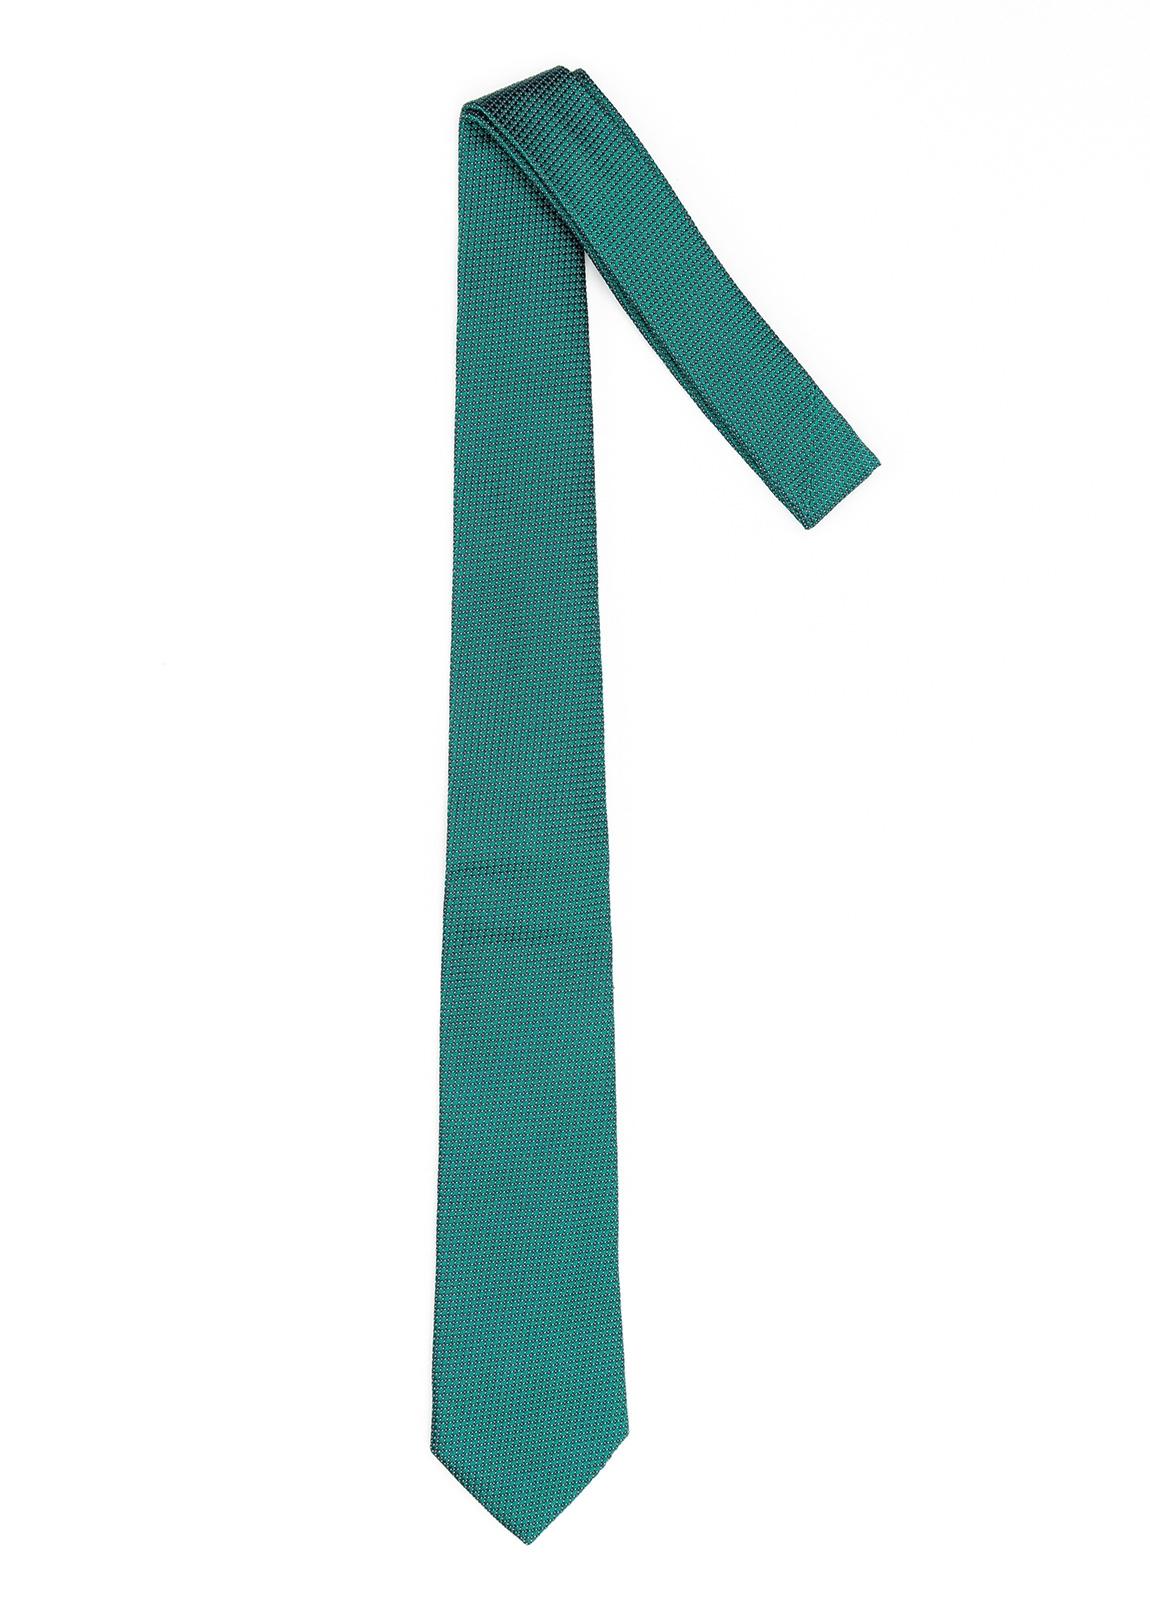 Corbata Formal Wear microtextura color verde. Pala 7,5 cm. 100% Seda. - Ítem1